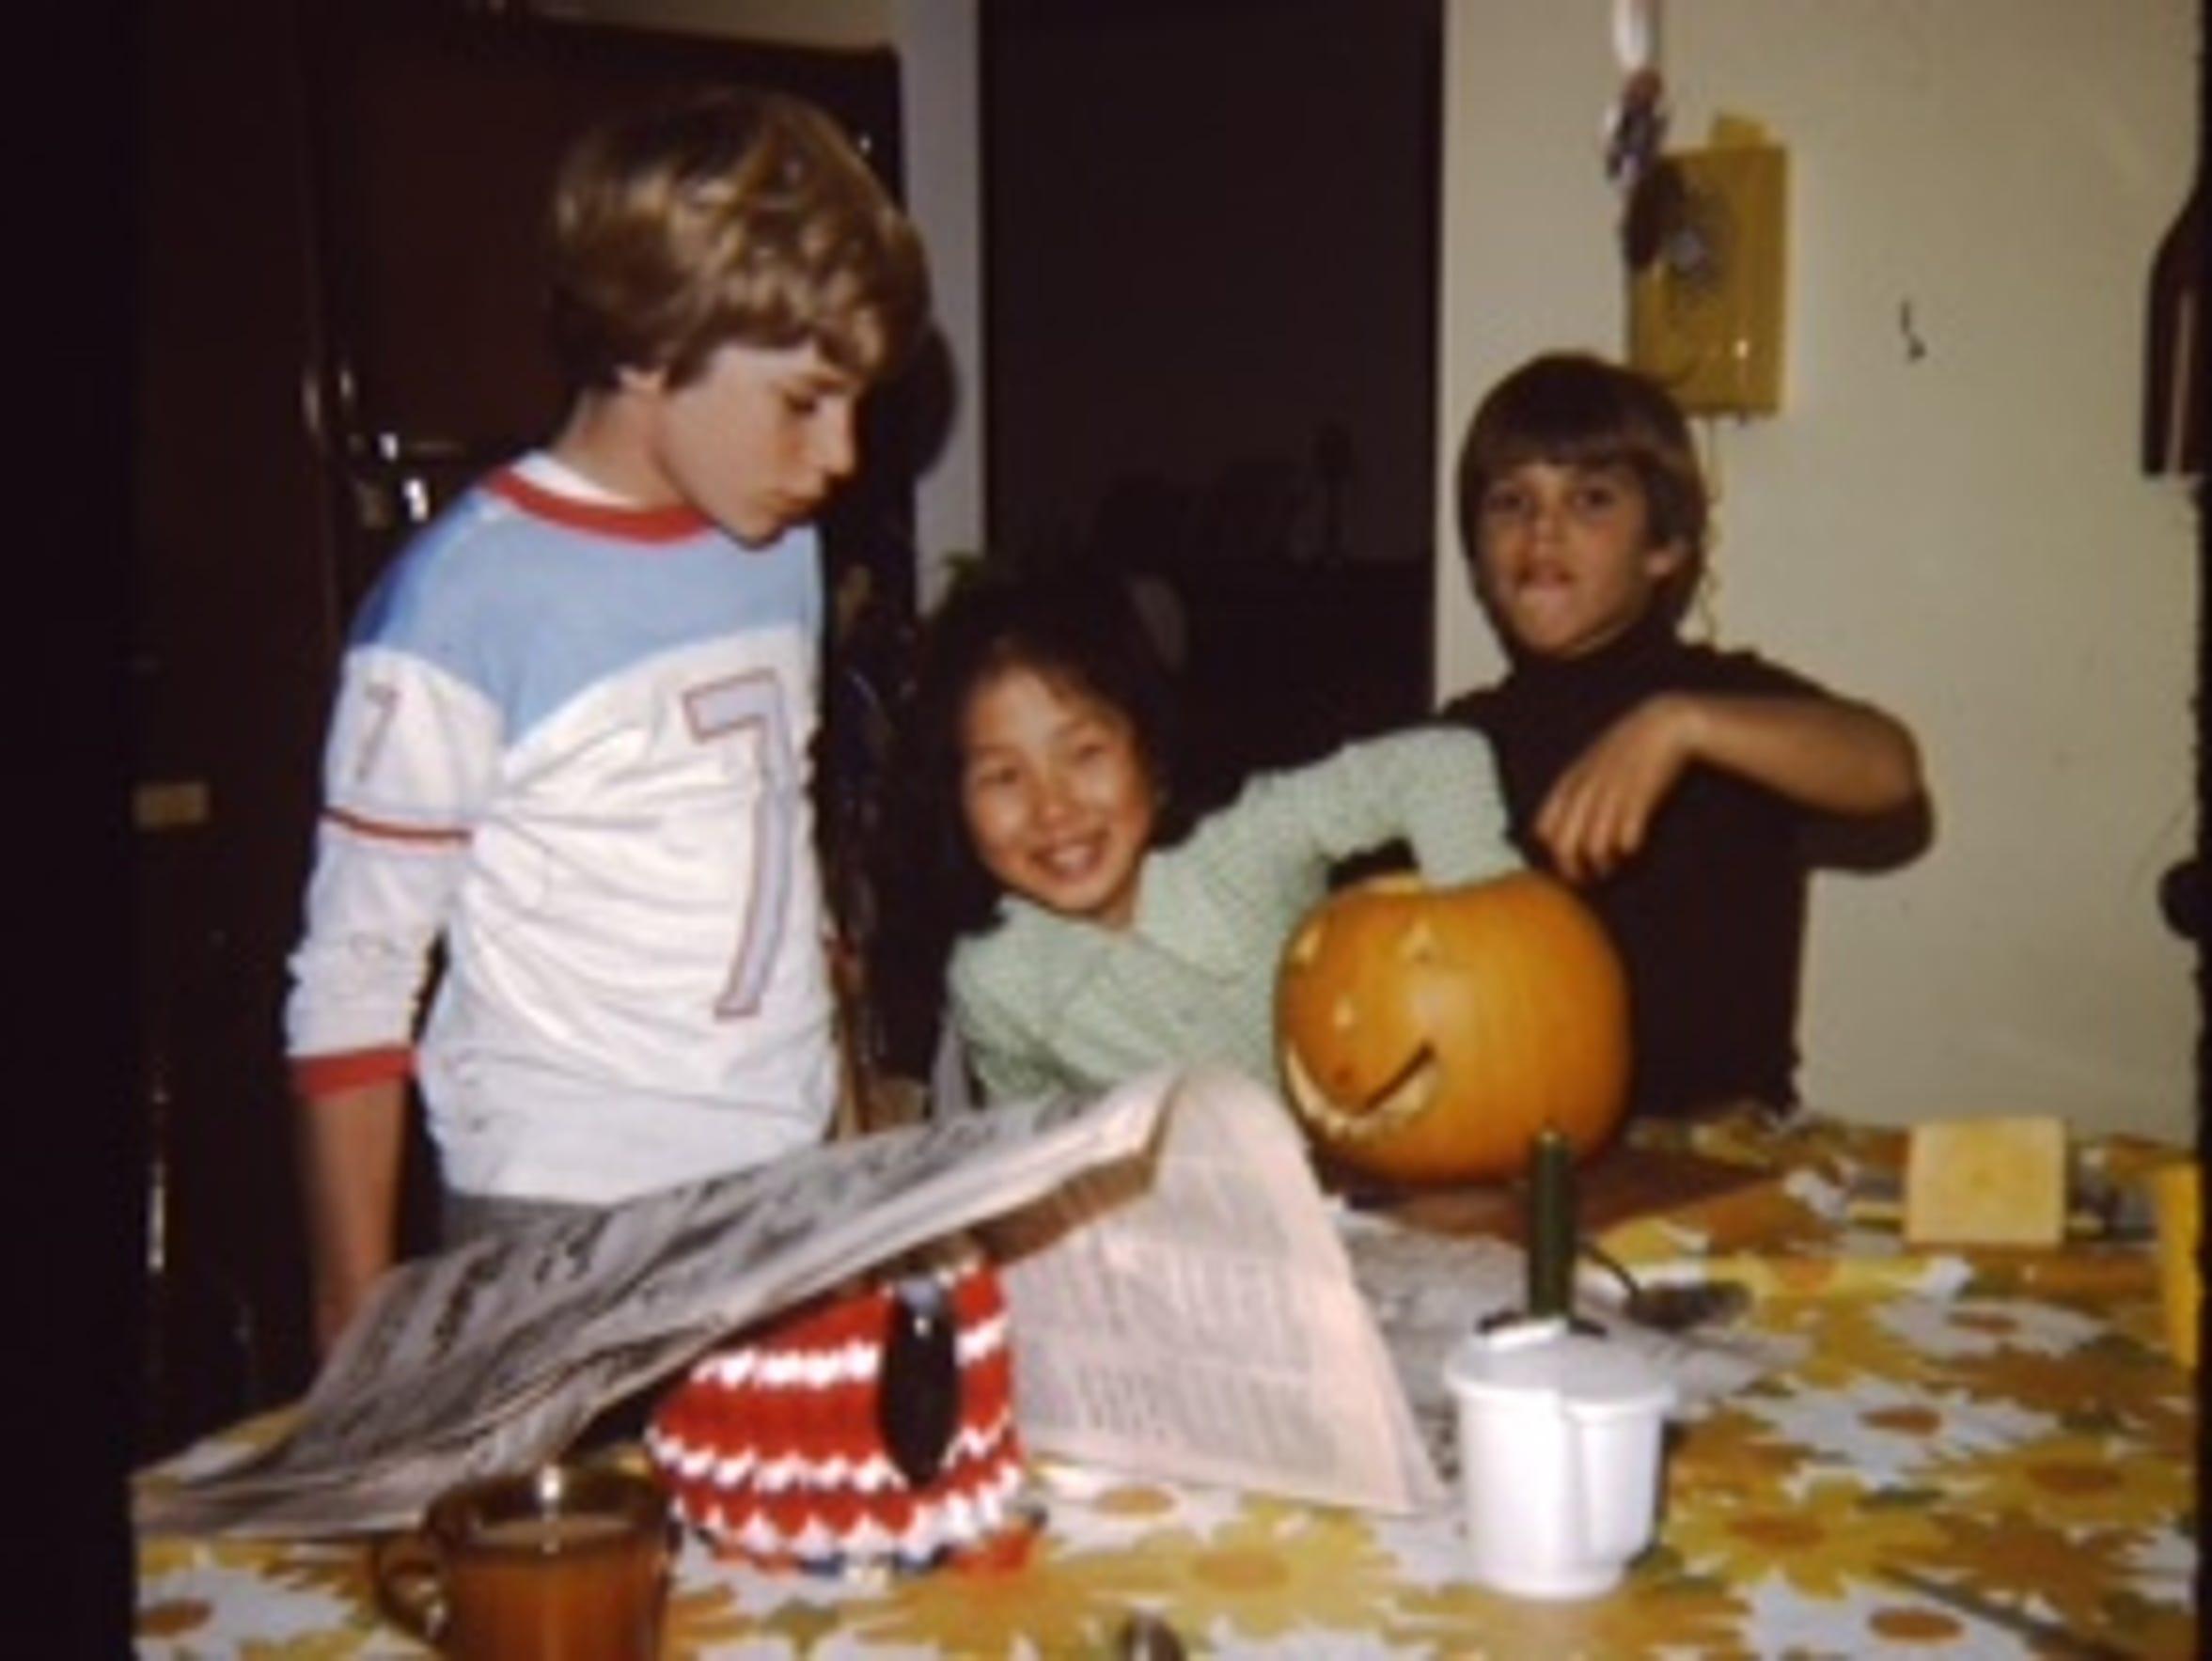 A young Kim Pegula, center, carving pumpkins with her